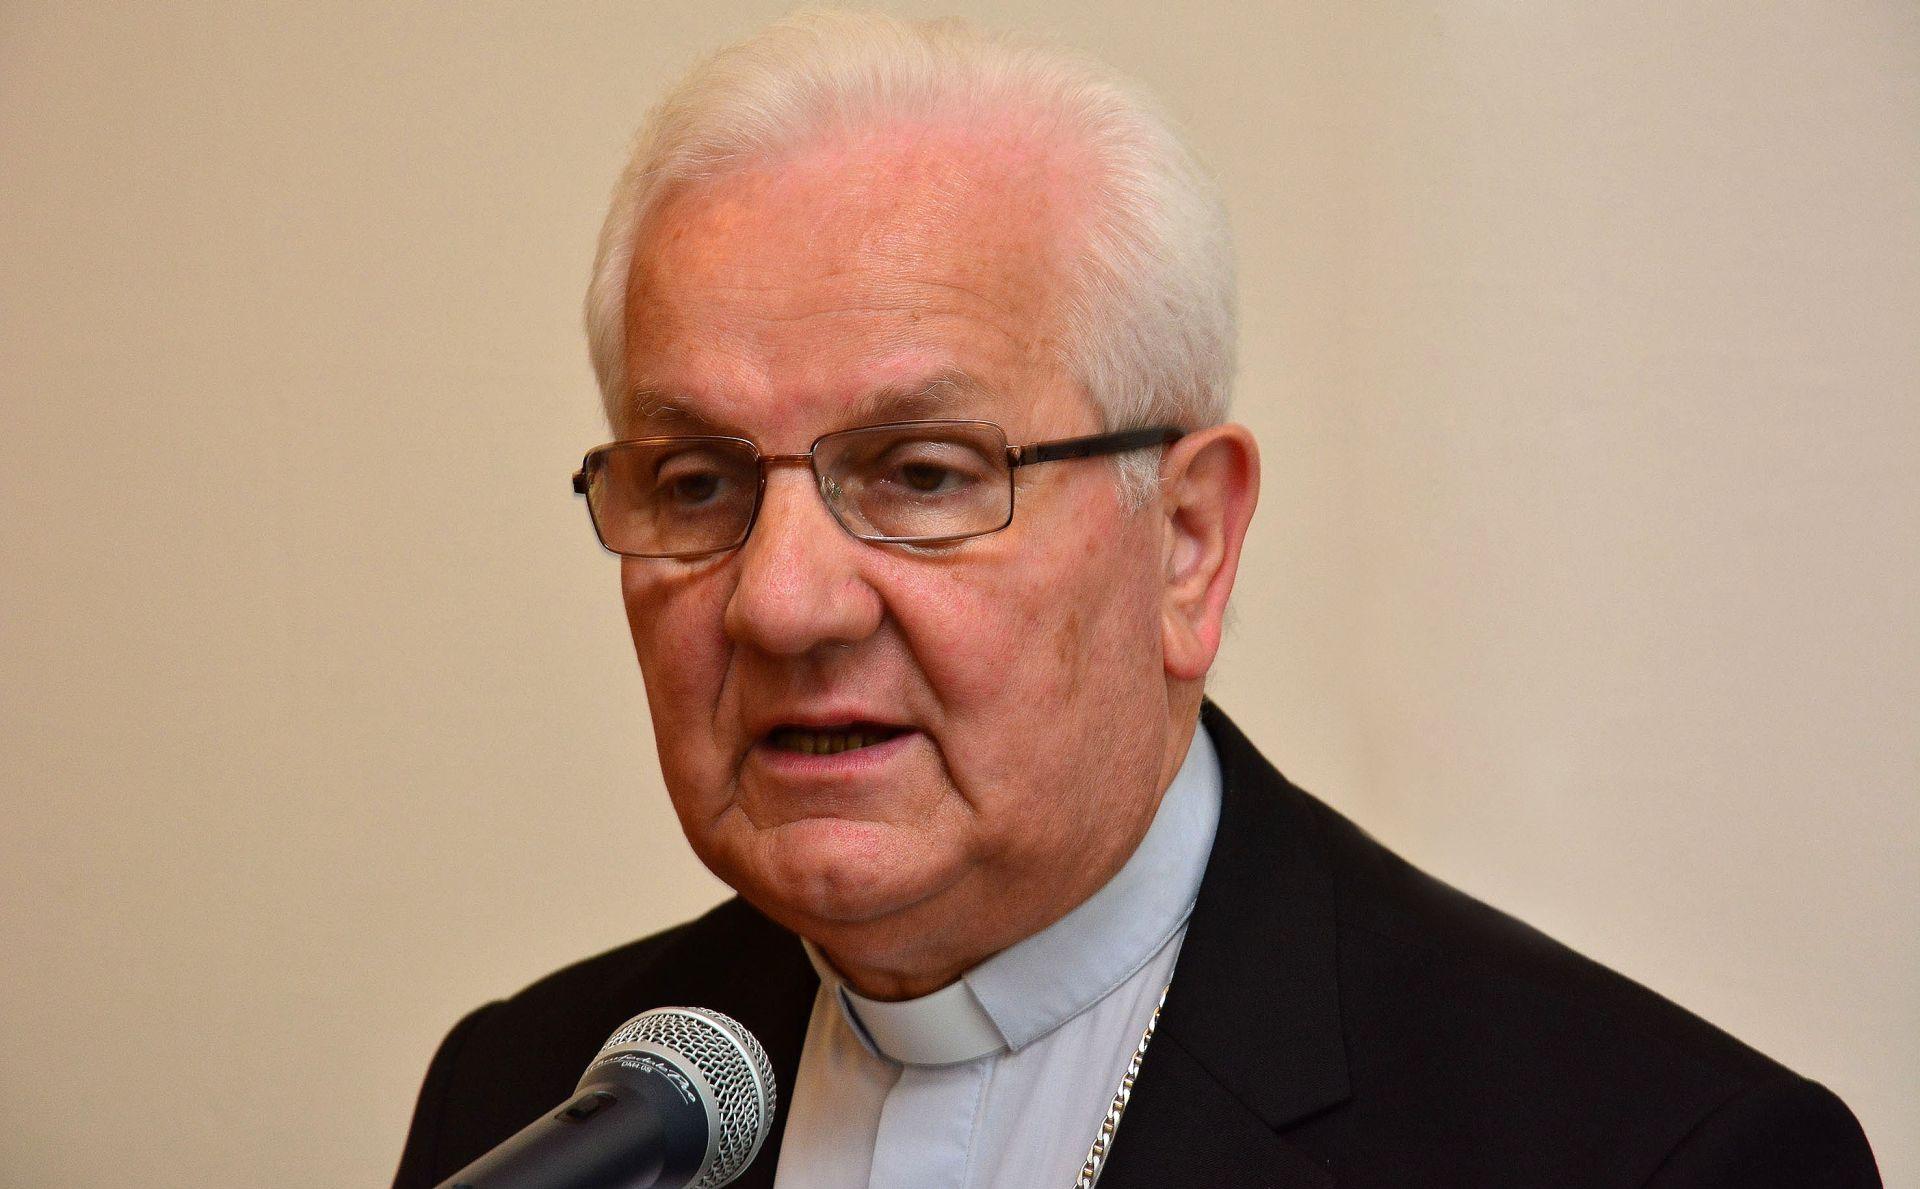 BISKUP KOMARICA Manje Hrvata katolika u RS-u 2015. nego nakon progona 1995.